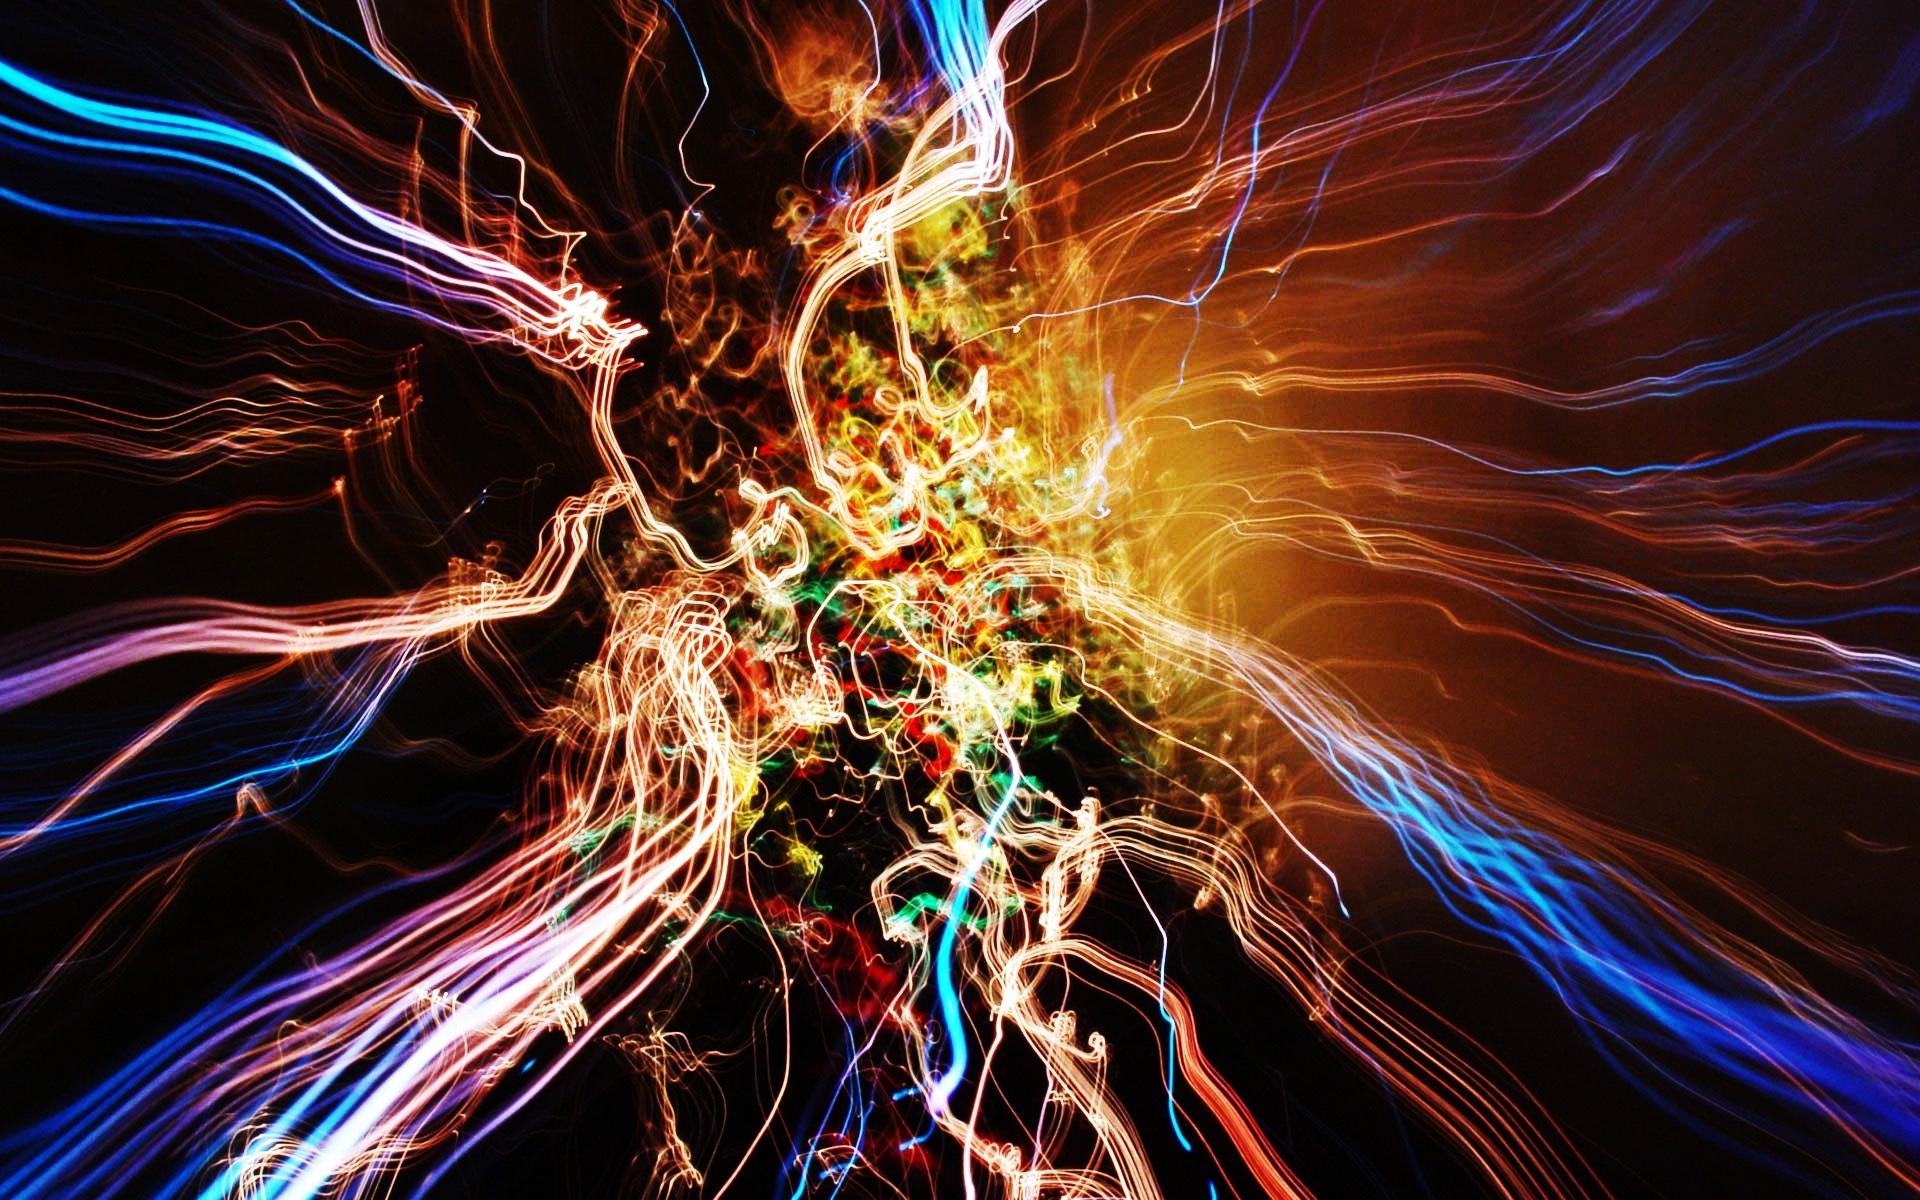 Amazing Colorful Lights